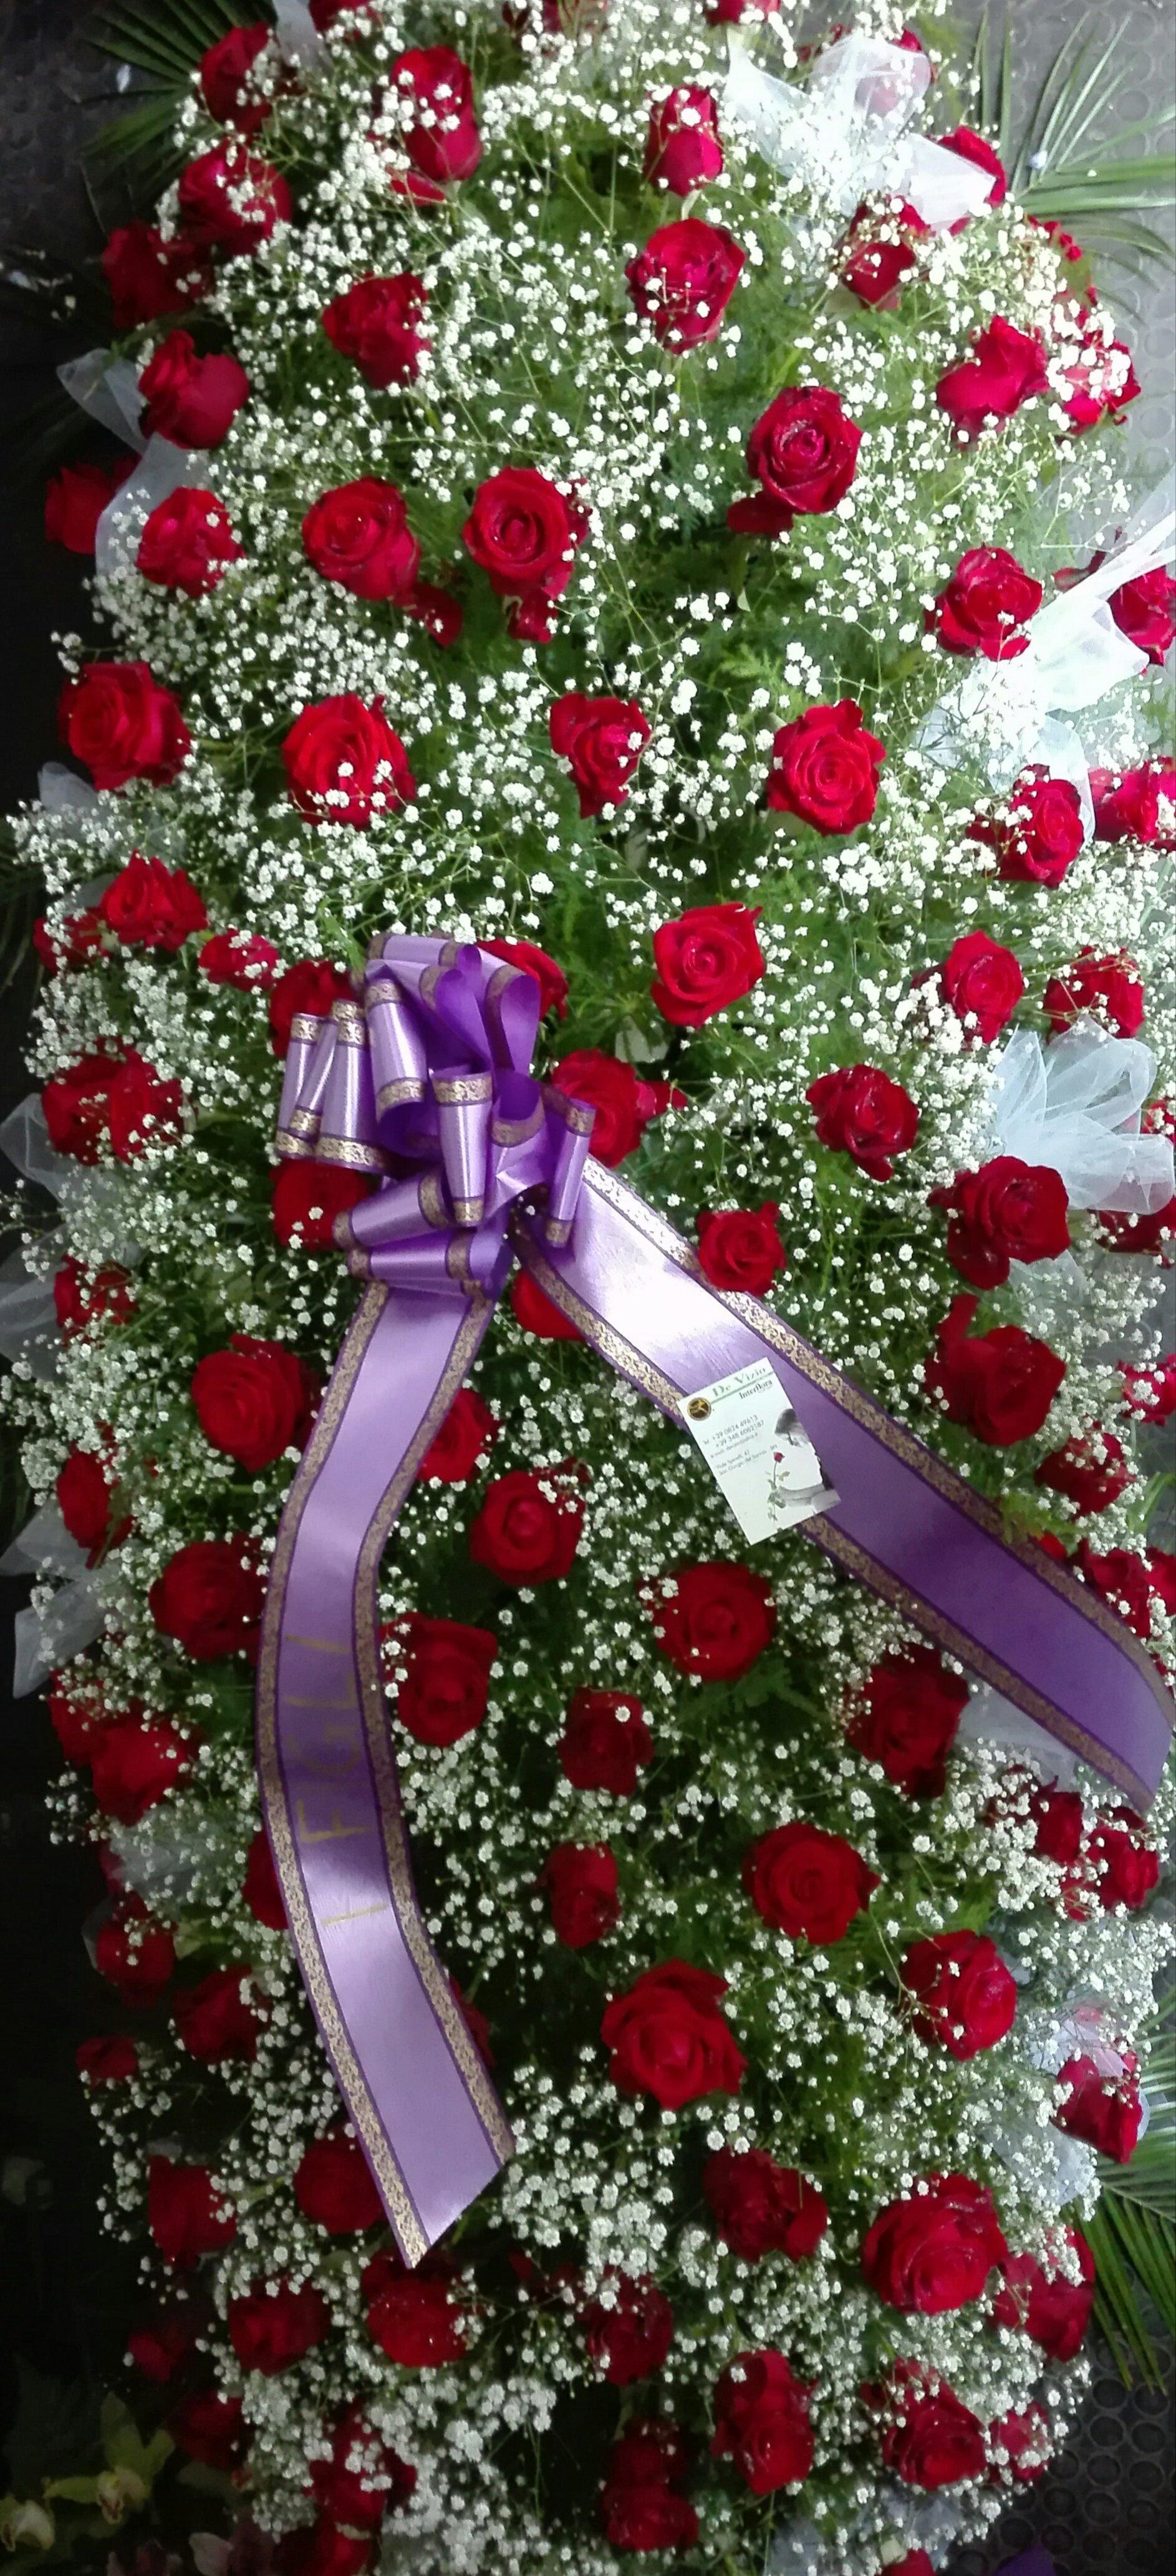 Composizione floreale di fiori selvatici bianchi e rose rosse